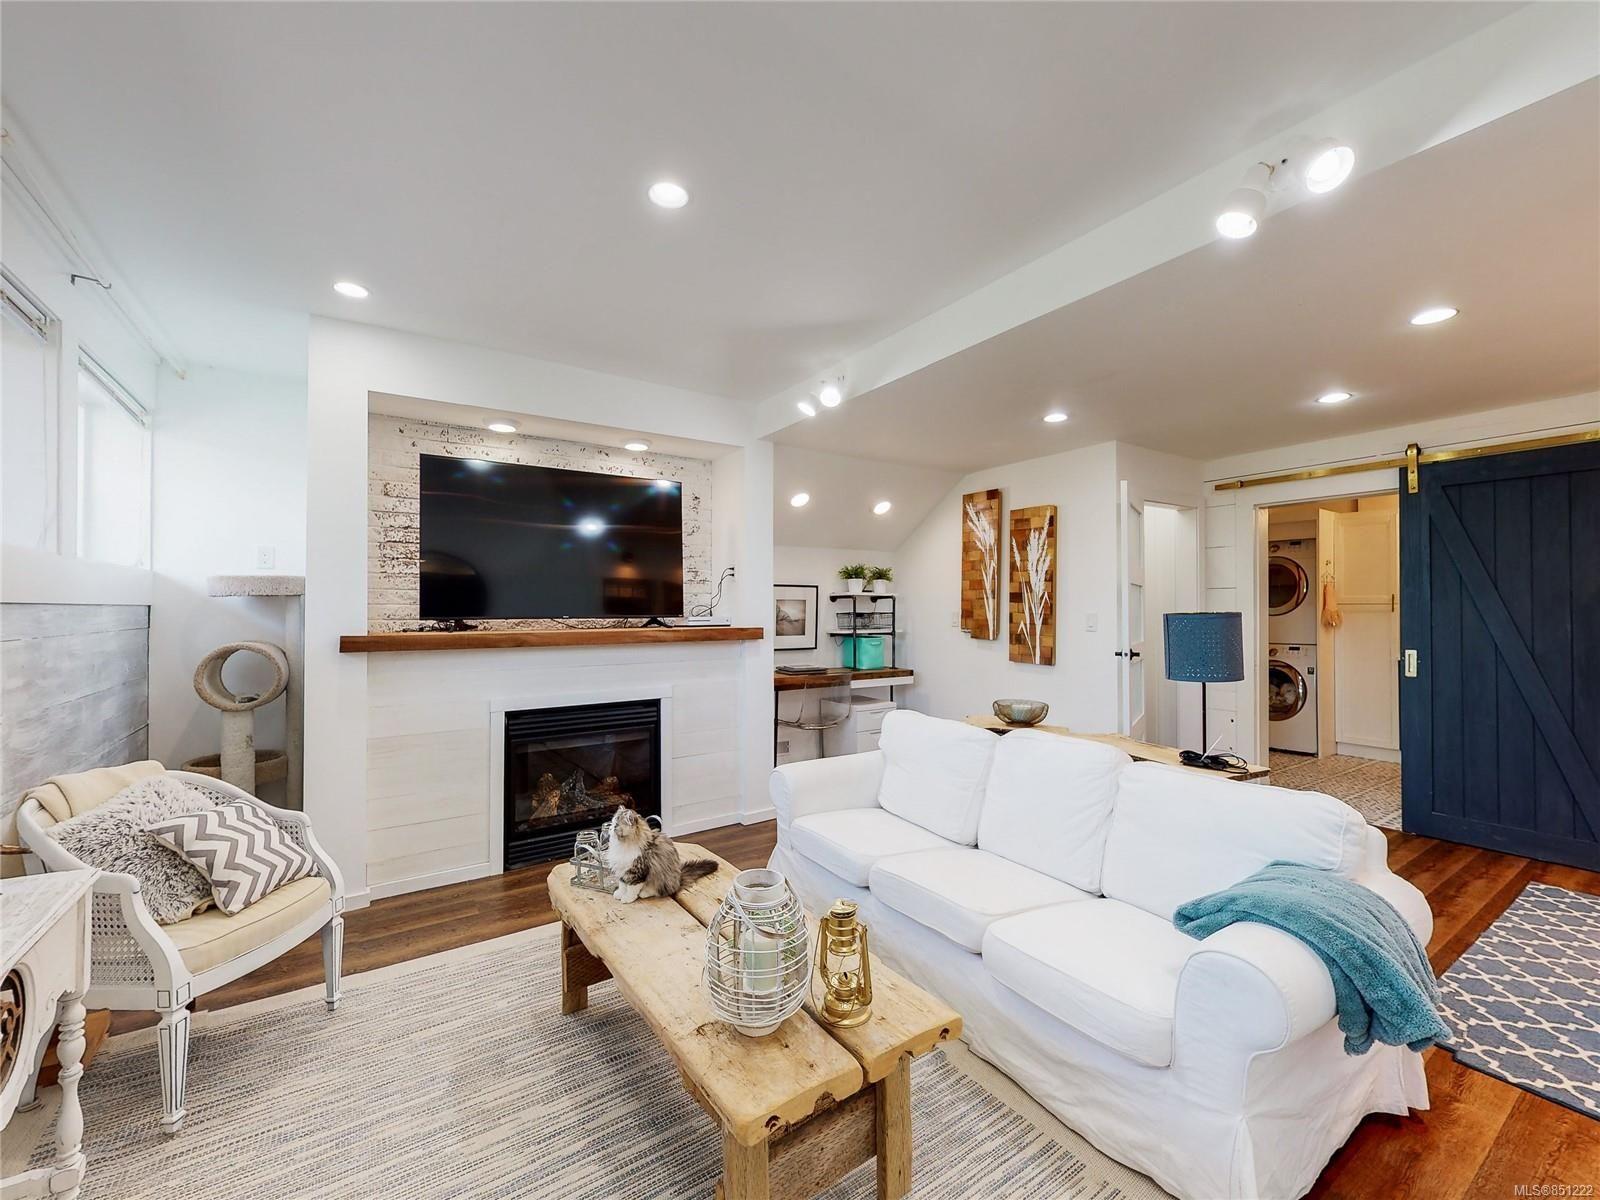 Photo 23: Photos: 2525 11th Ave in : PA Port Alberni House for sale (Port Alberni)  : MLS®# 851222